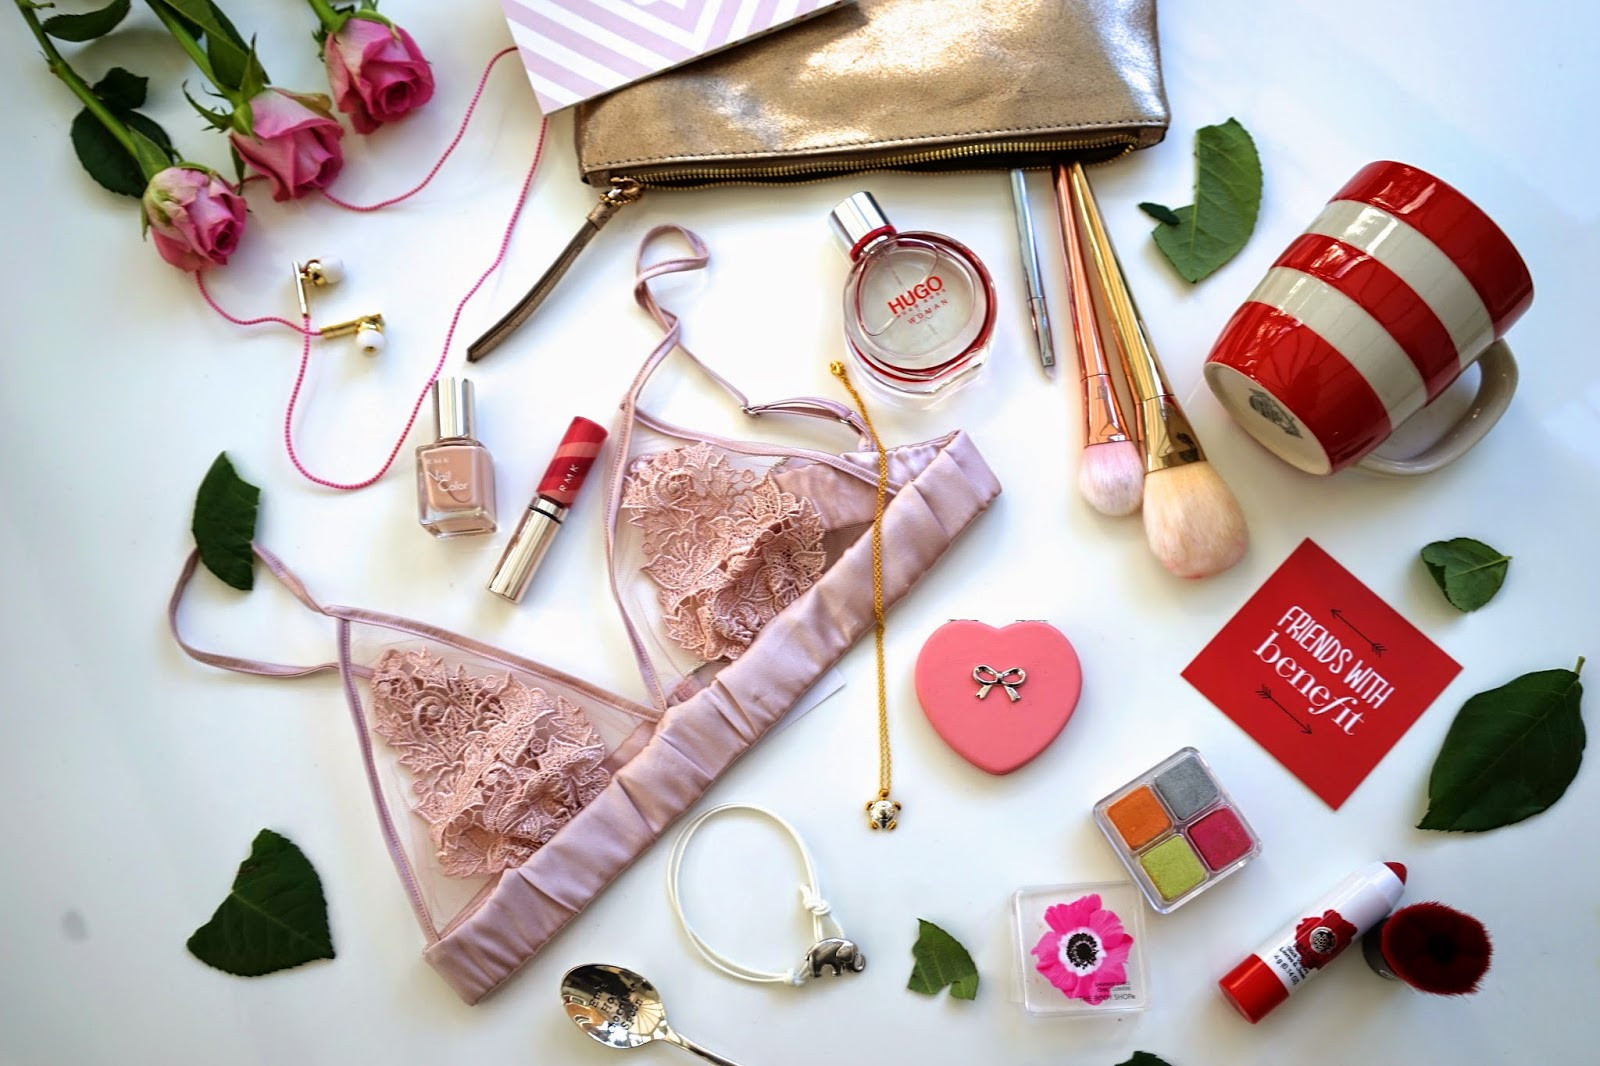 Ideas For Valentine Gift  Emtalks Valentines Gift Ideas For Him & Her